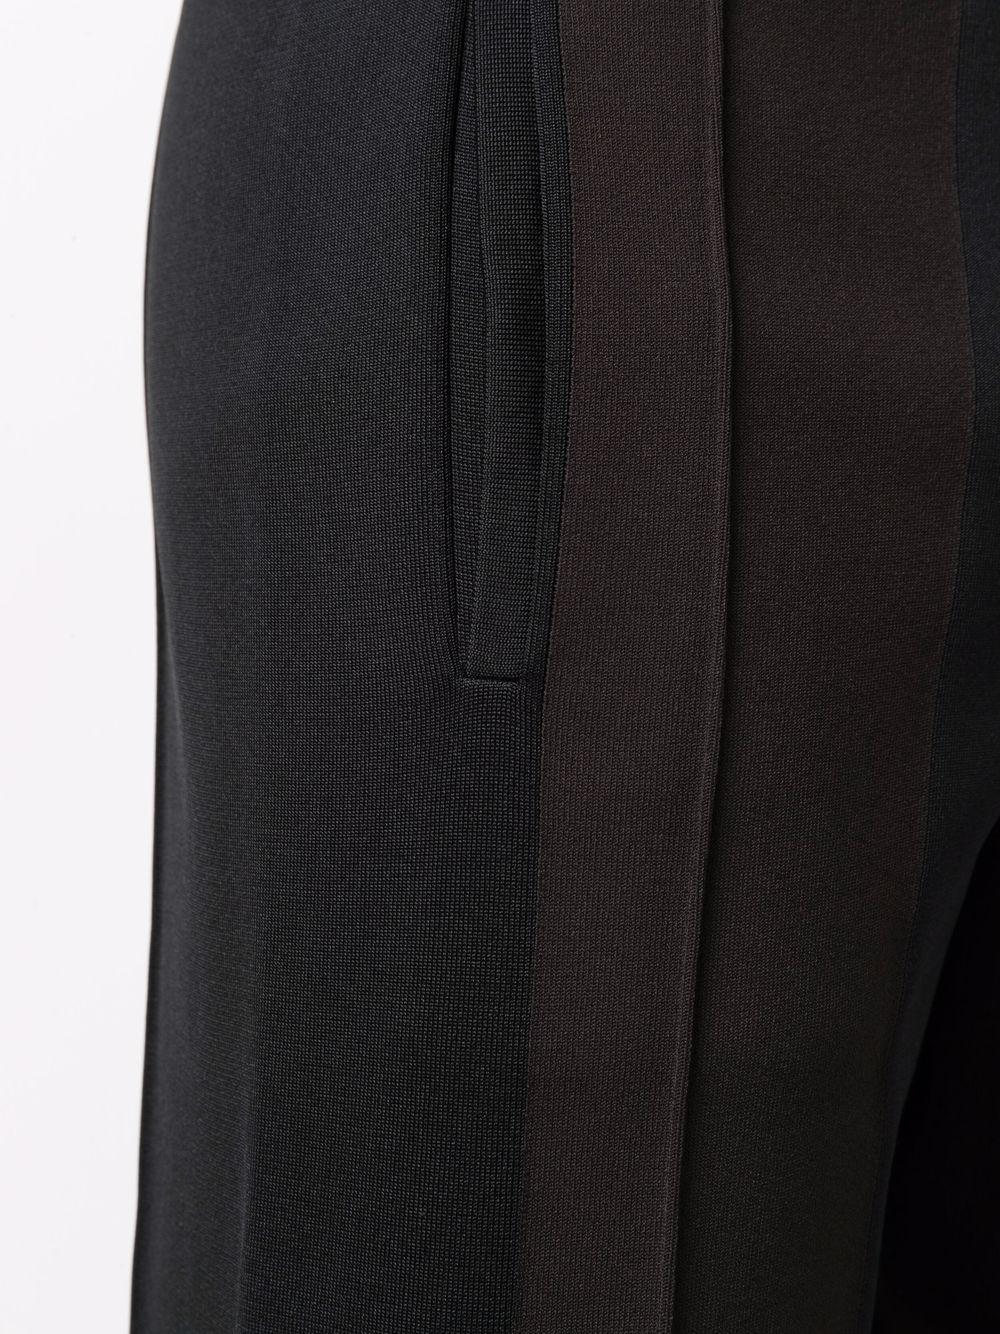 Picture of Bottega Veneta | Technical Double Panel Track Trousers